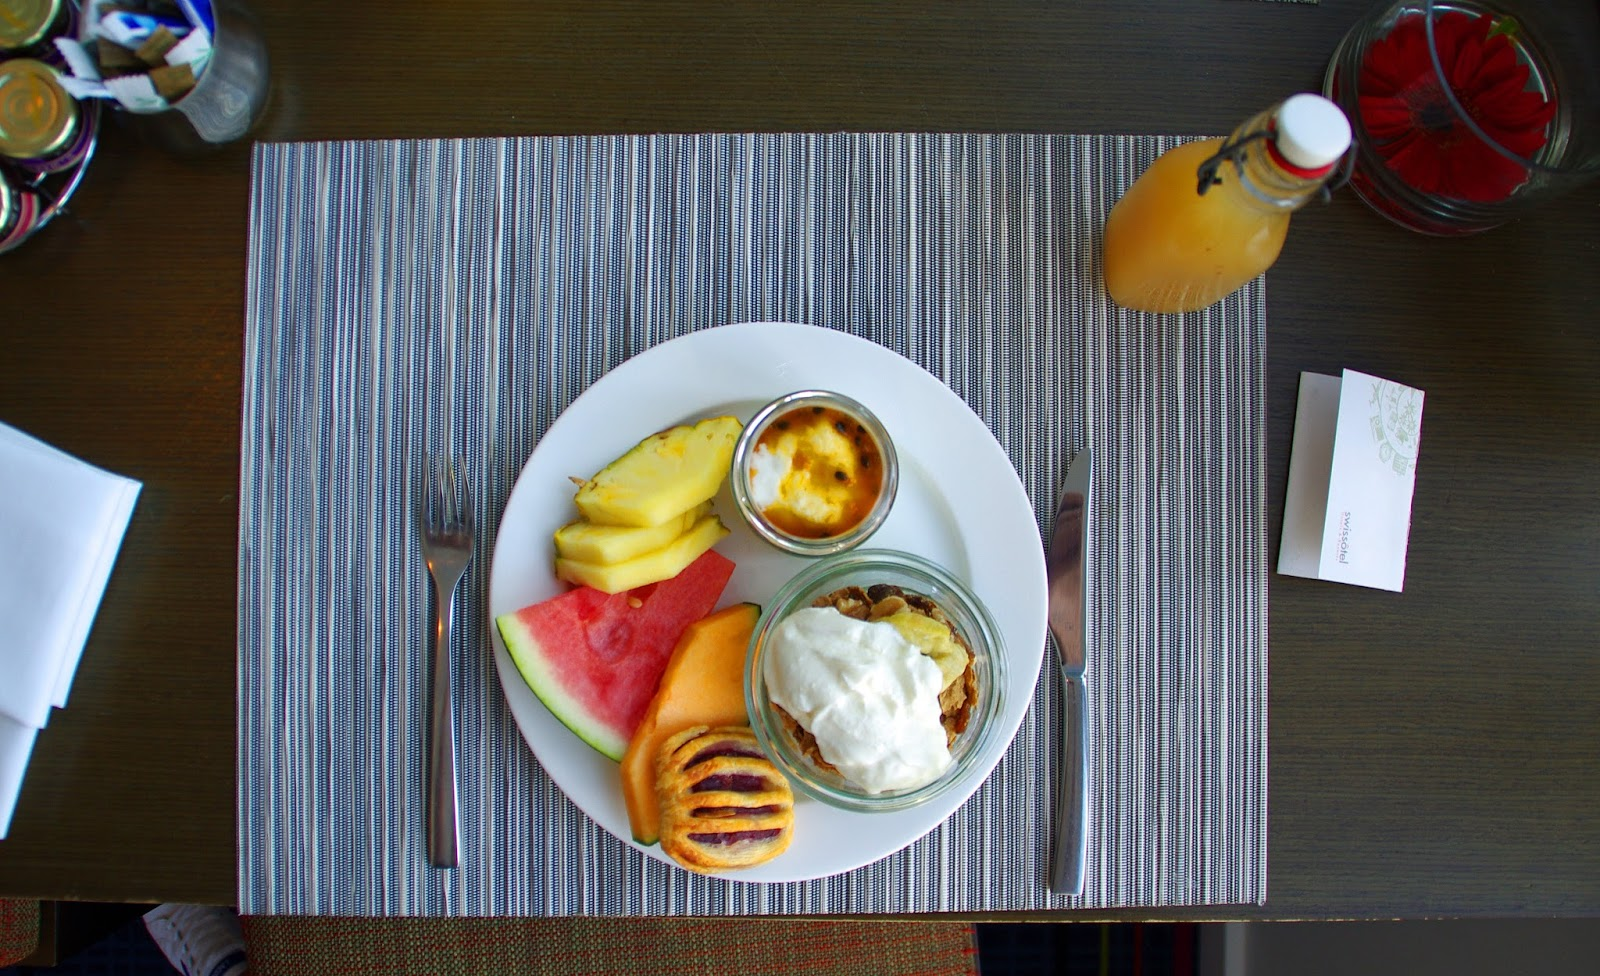 Luxury Hotel Breakfasts at swissotel Sydney